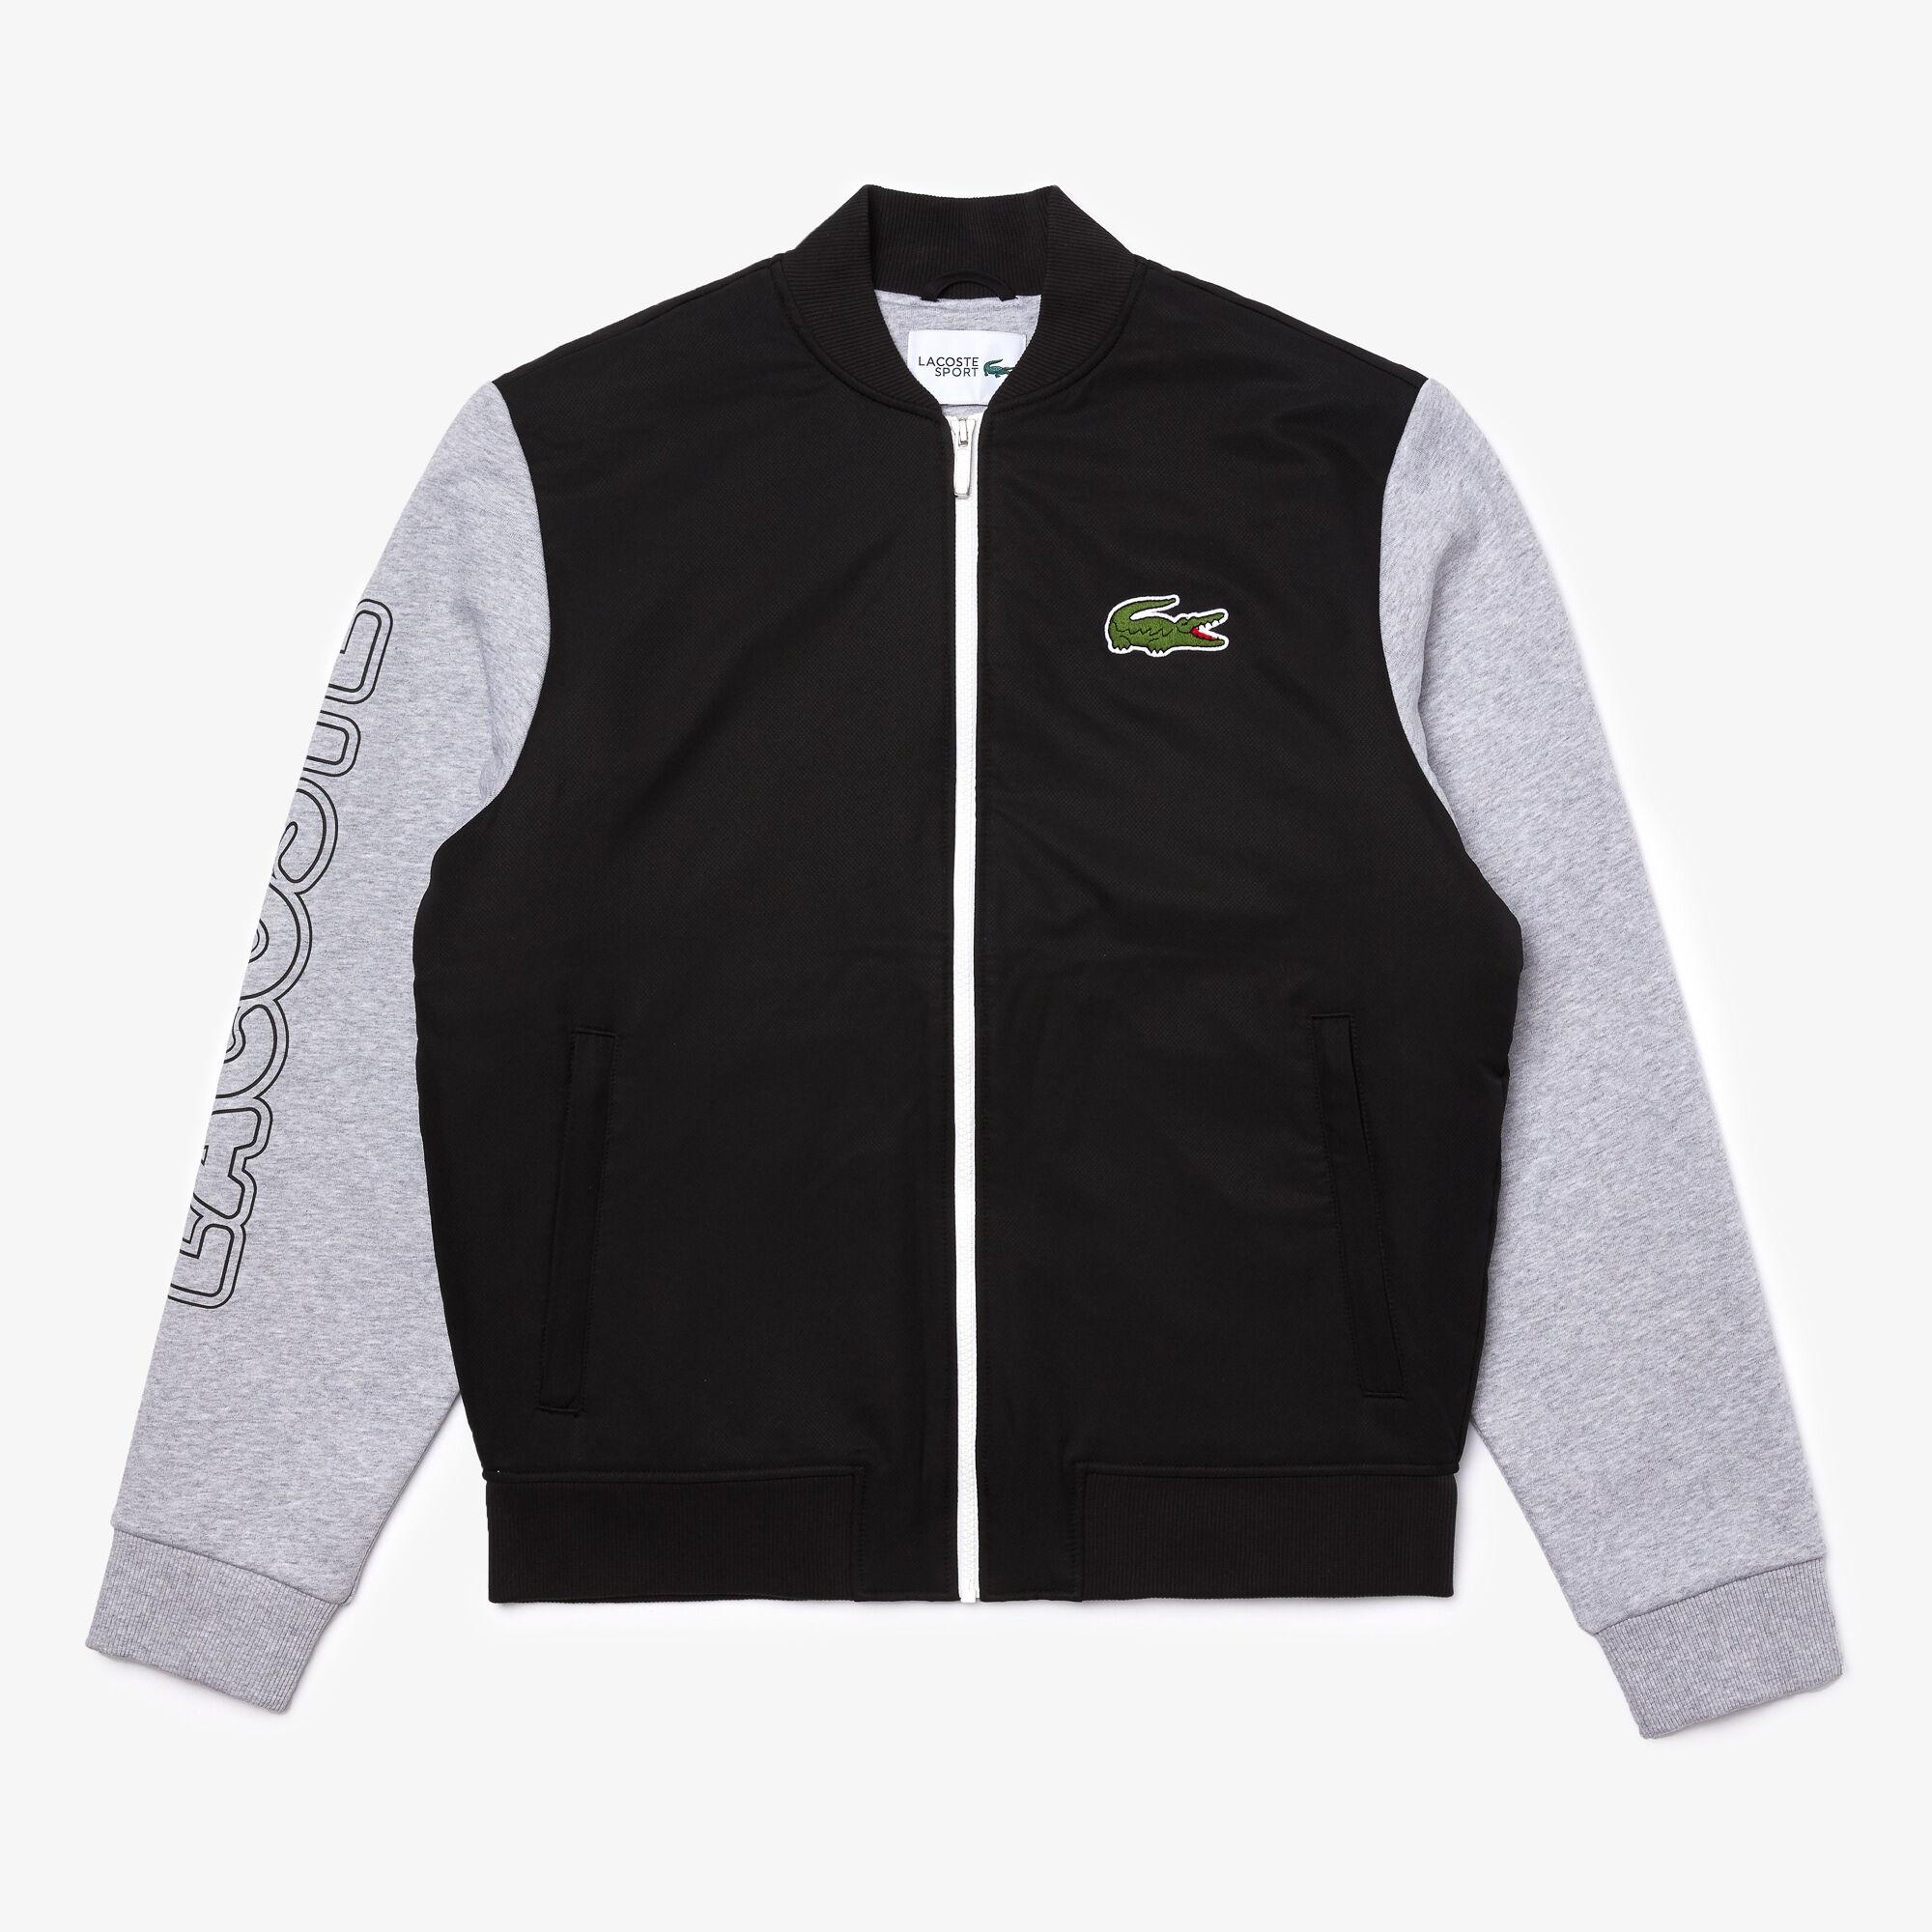 Men's Lacoste SPORT Two-Tone Print Fleece Zip Teddy Jacket